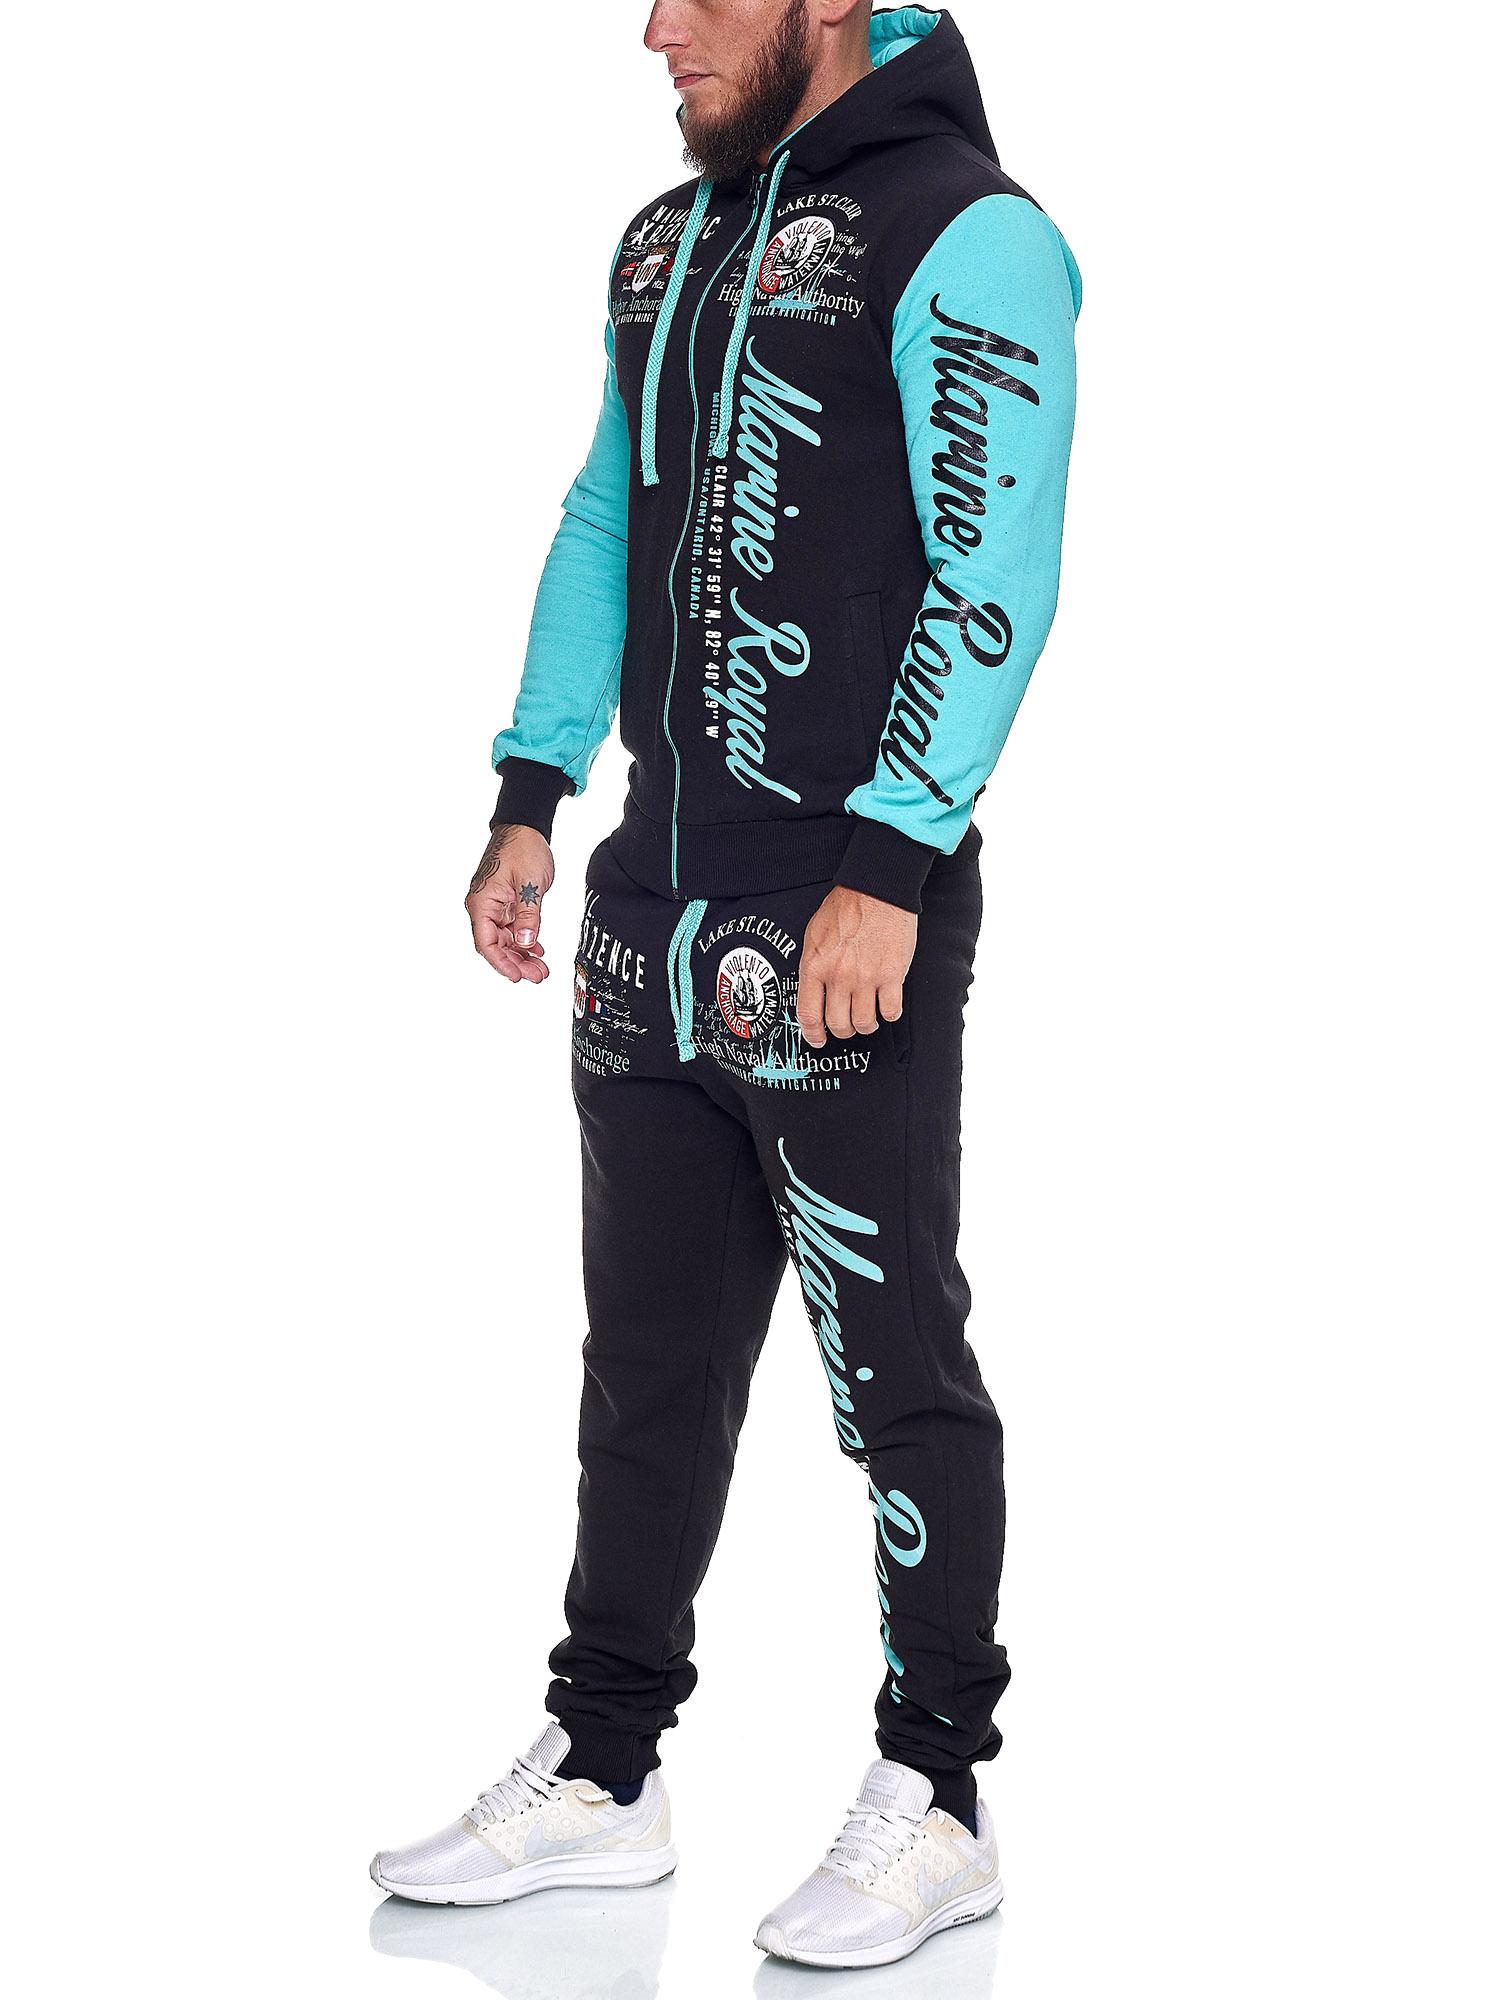 Damen-Jogginganzug-Frauen-Trainingsanzug-Sportanzug-Streetwear-JG-512-John-Kayna Indexbild 44